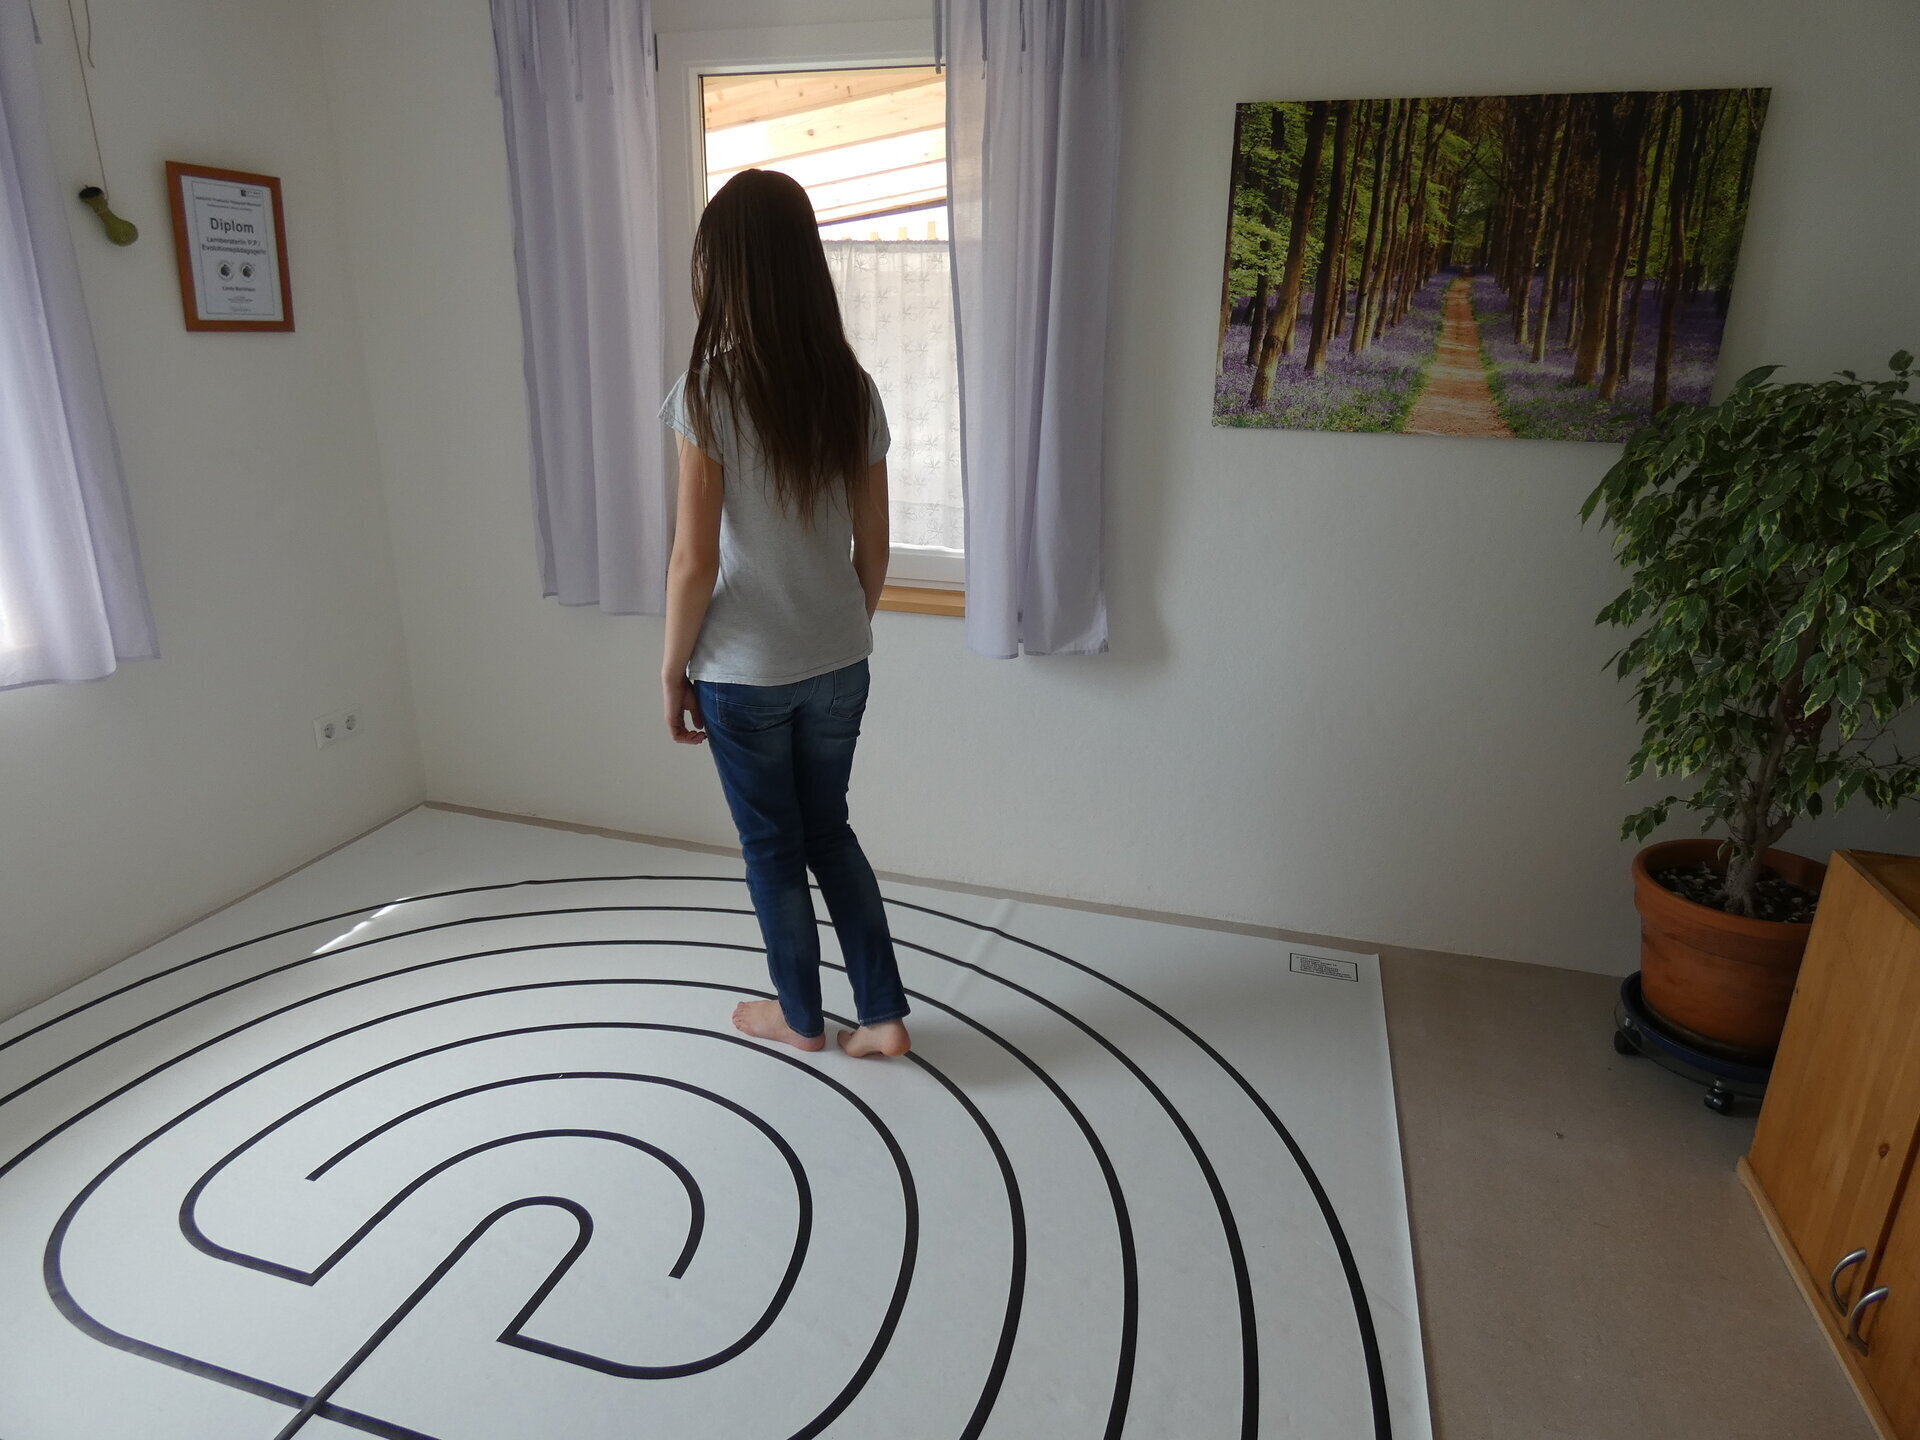 Übung im Labyrinth